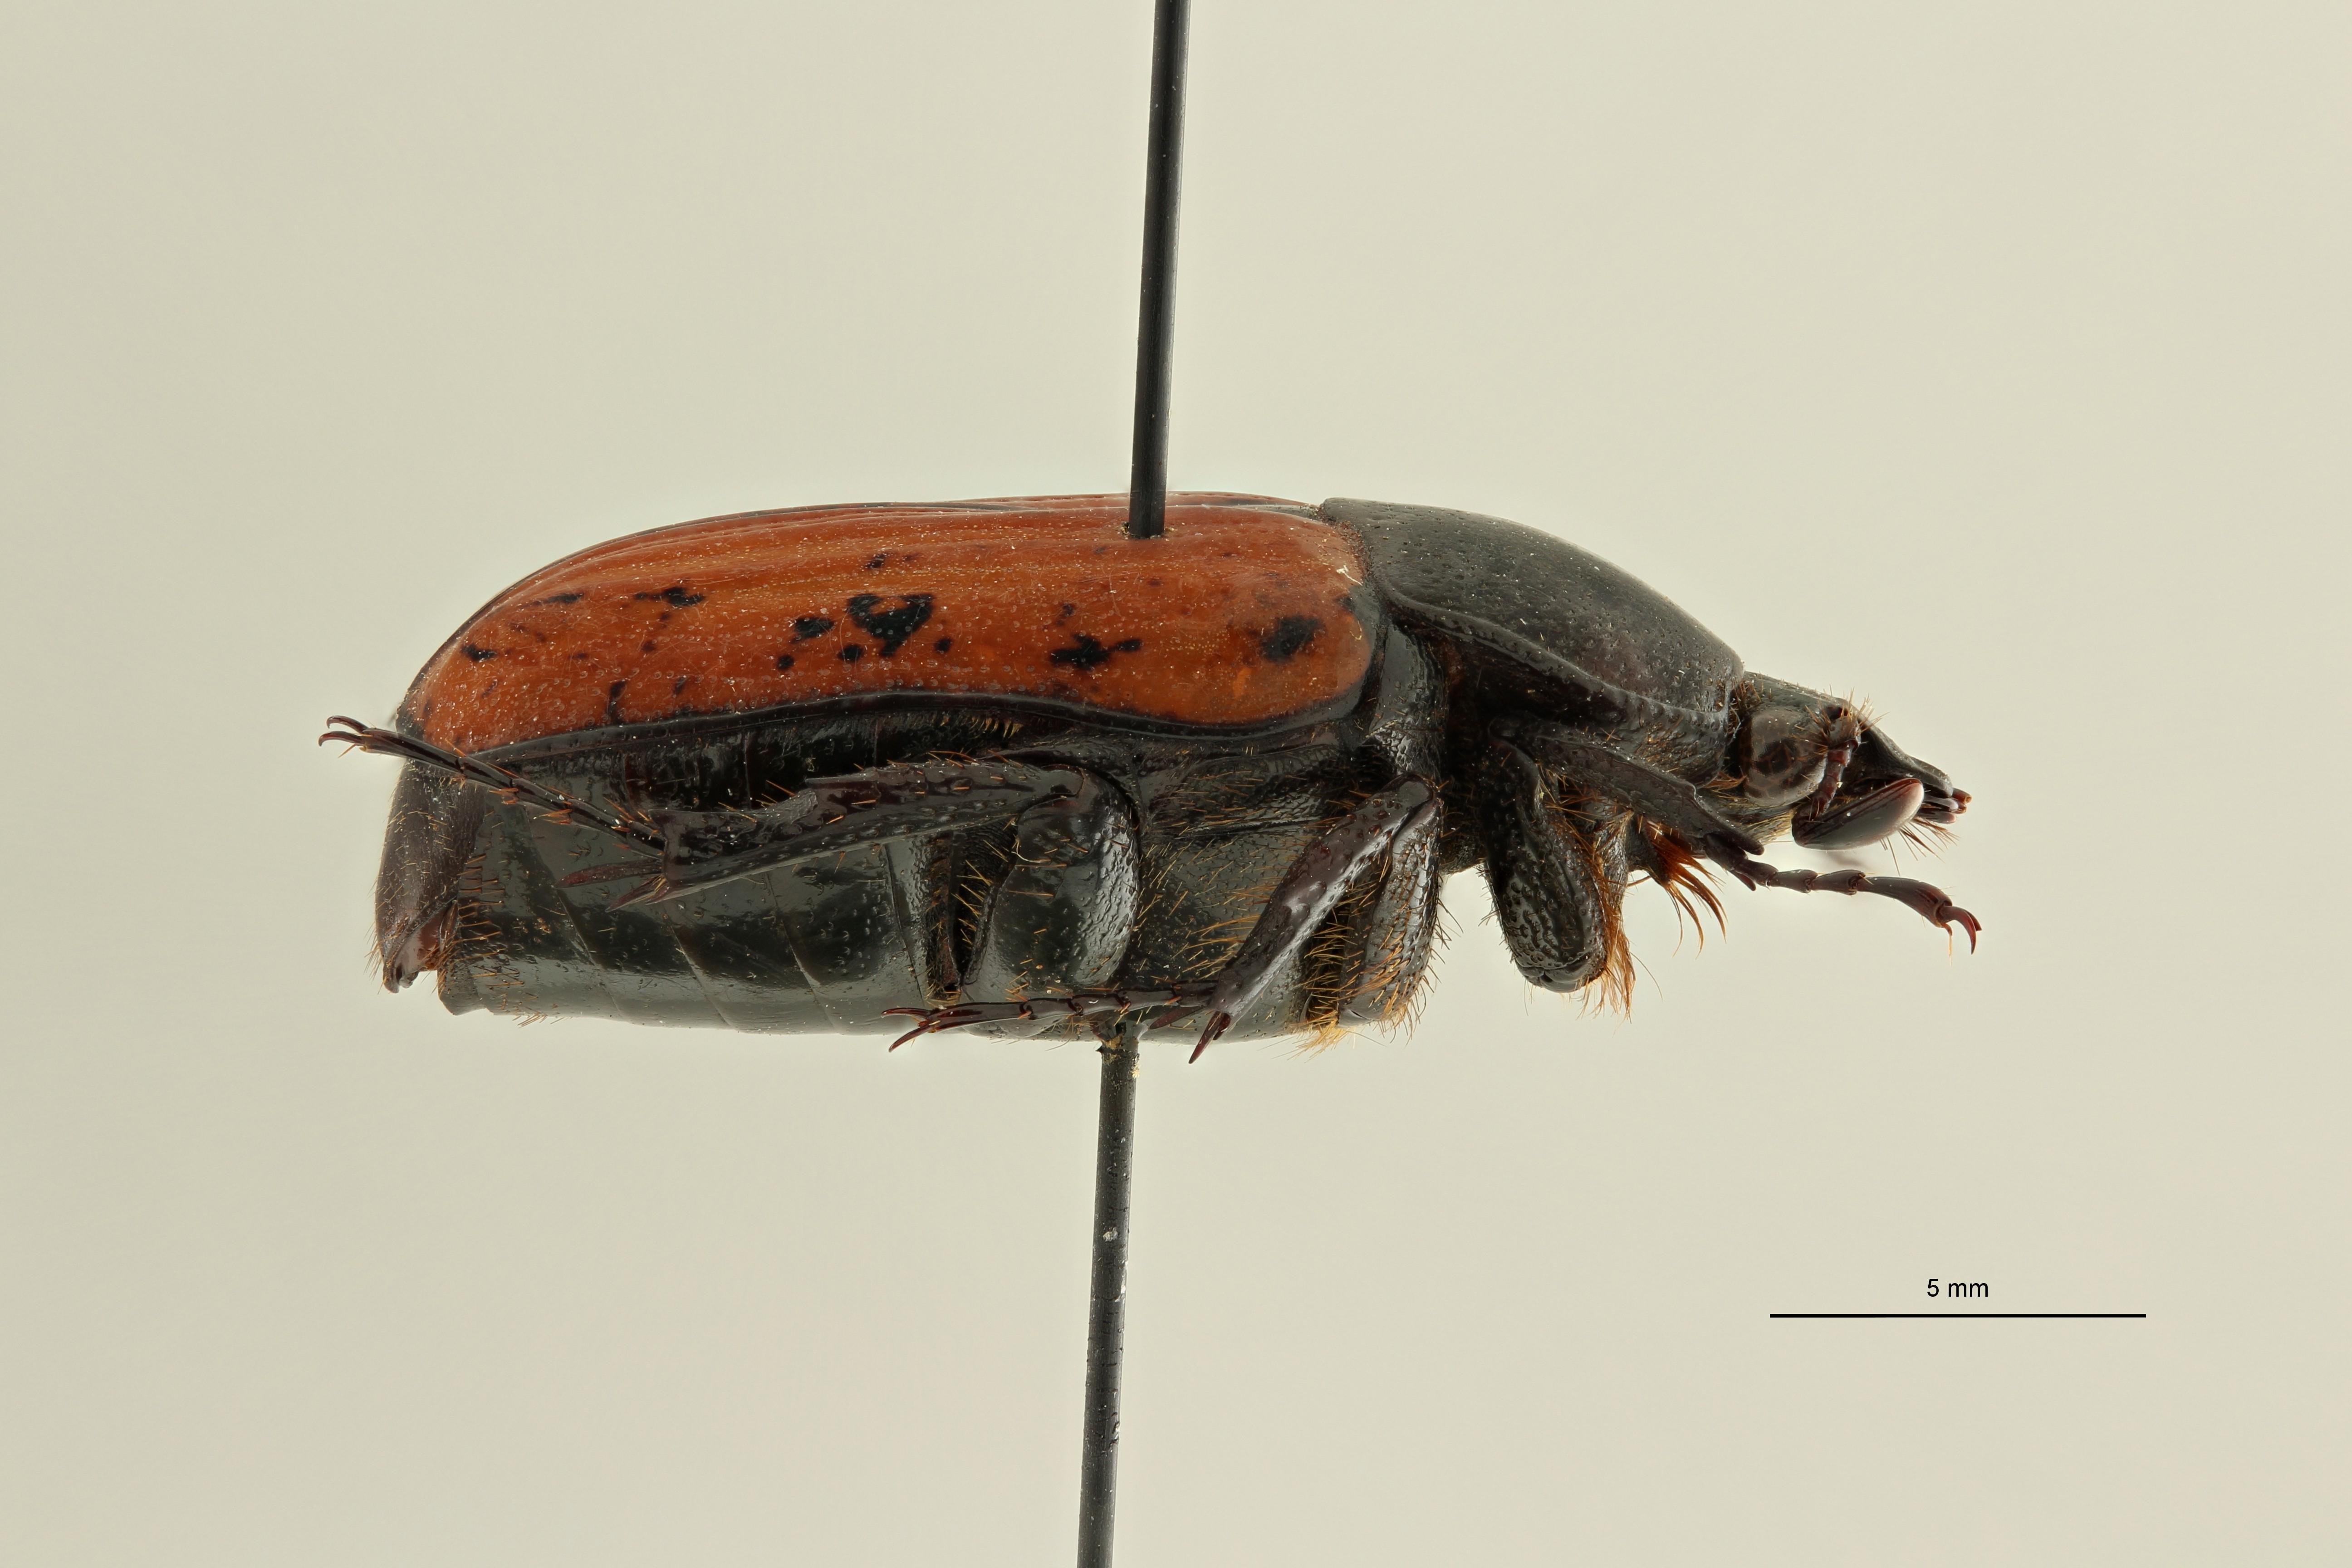 Centrantyx (Nigrocentrantyx) digennaroi at L ZS PMax Scaled.jpeg